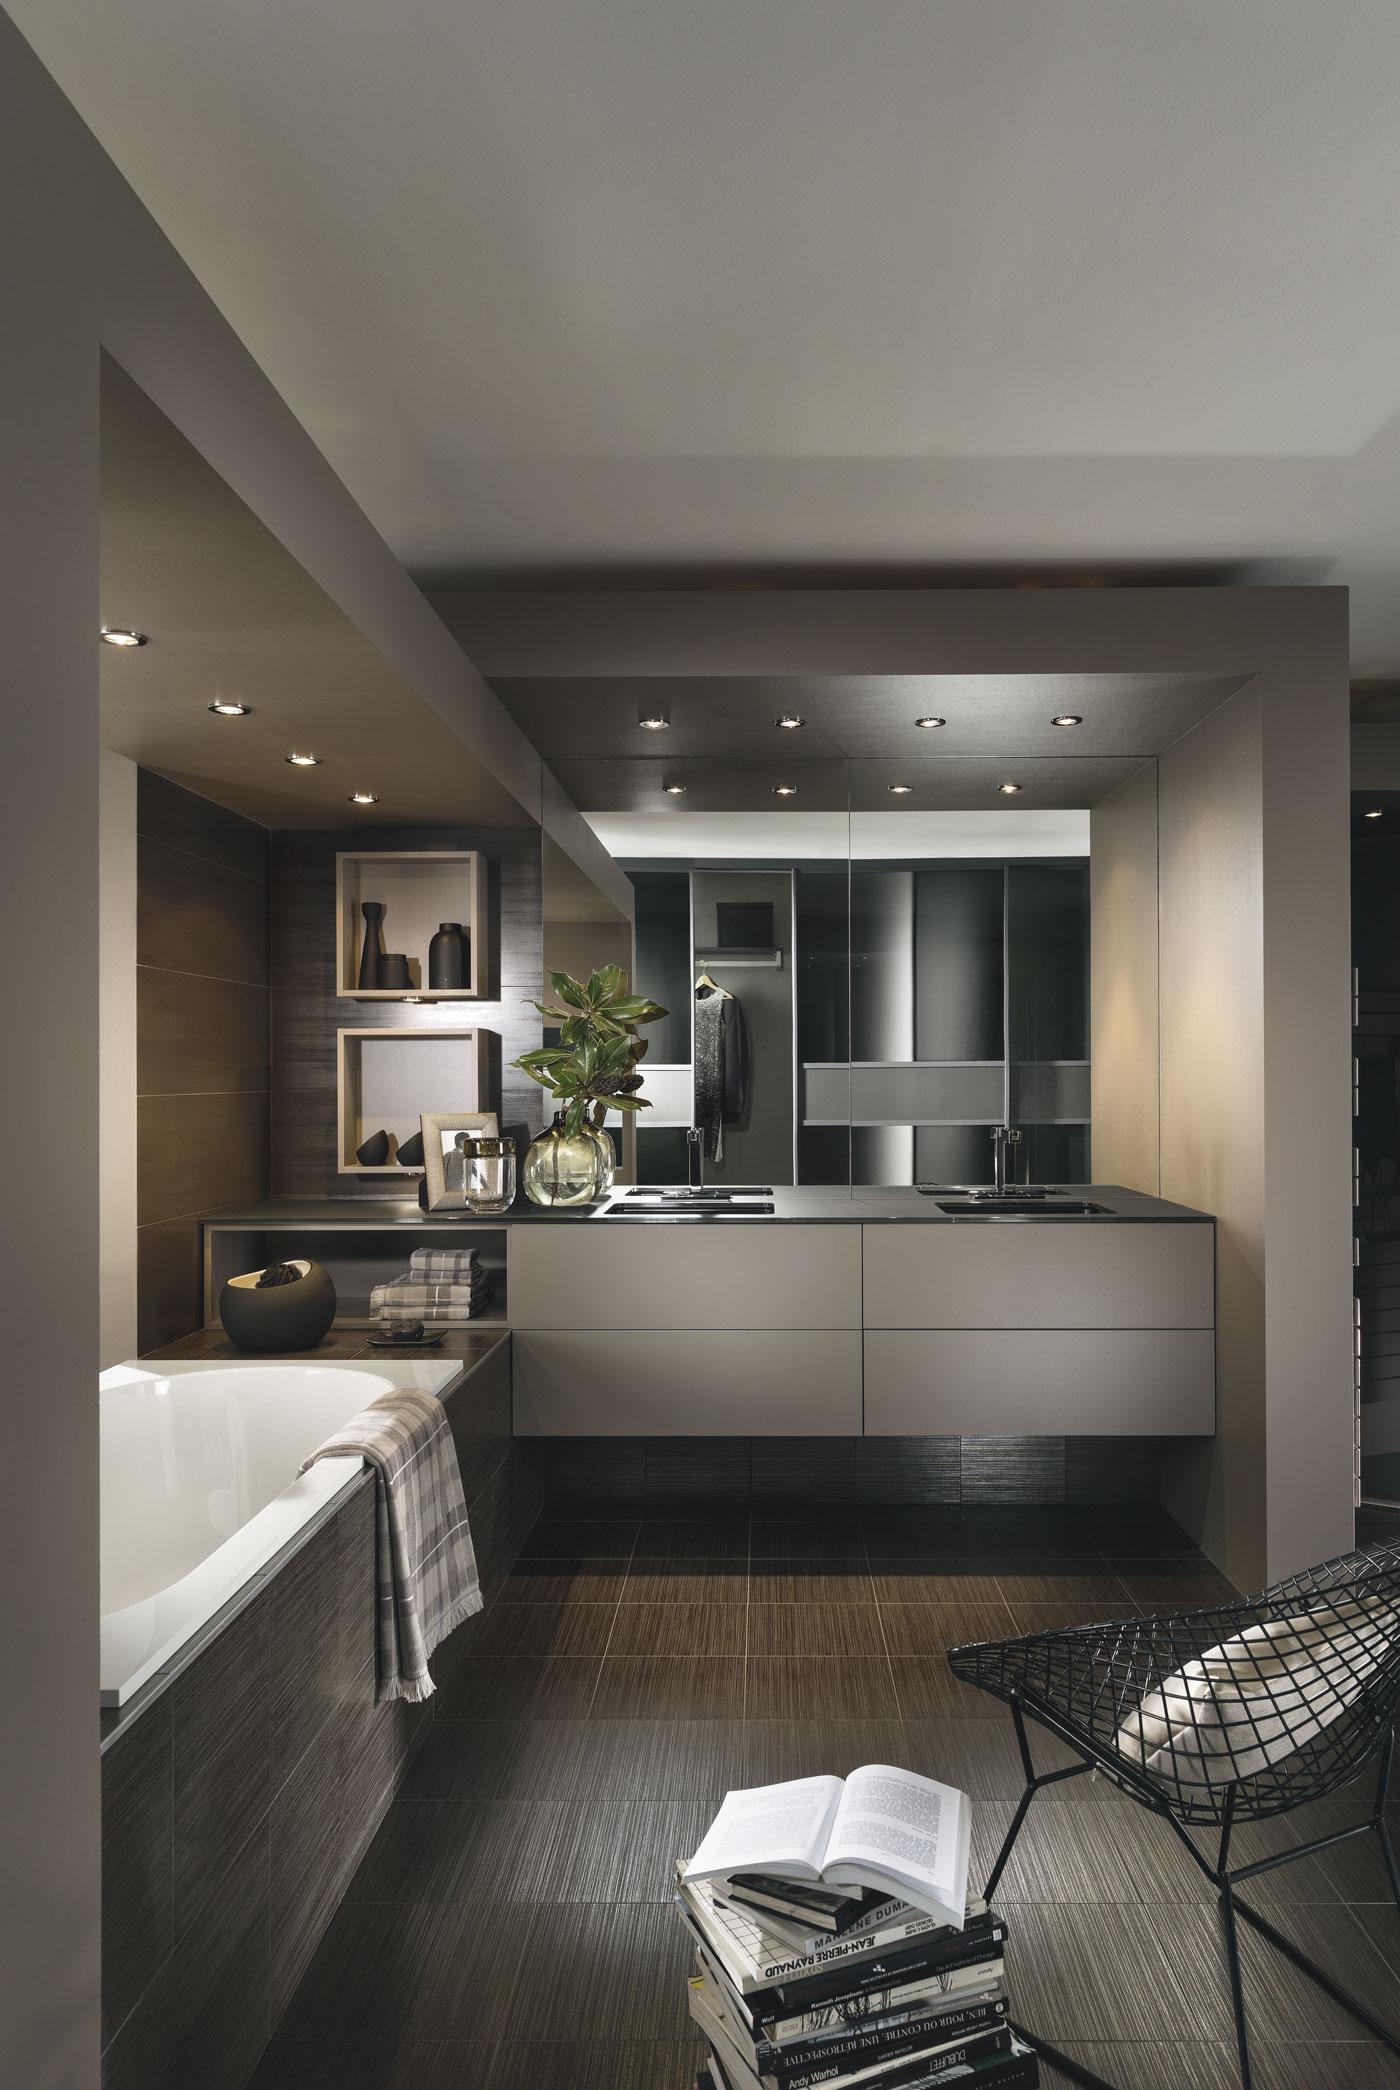 salle de bain m100 m lamin fango perene lyon. Black Bedroom Furniture Sets. Home Design Ideas